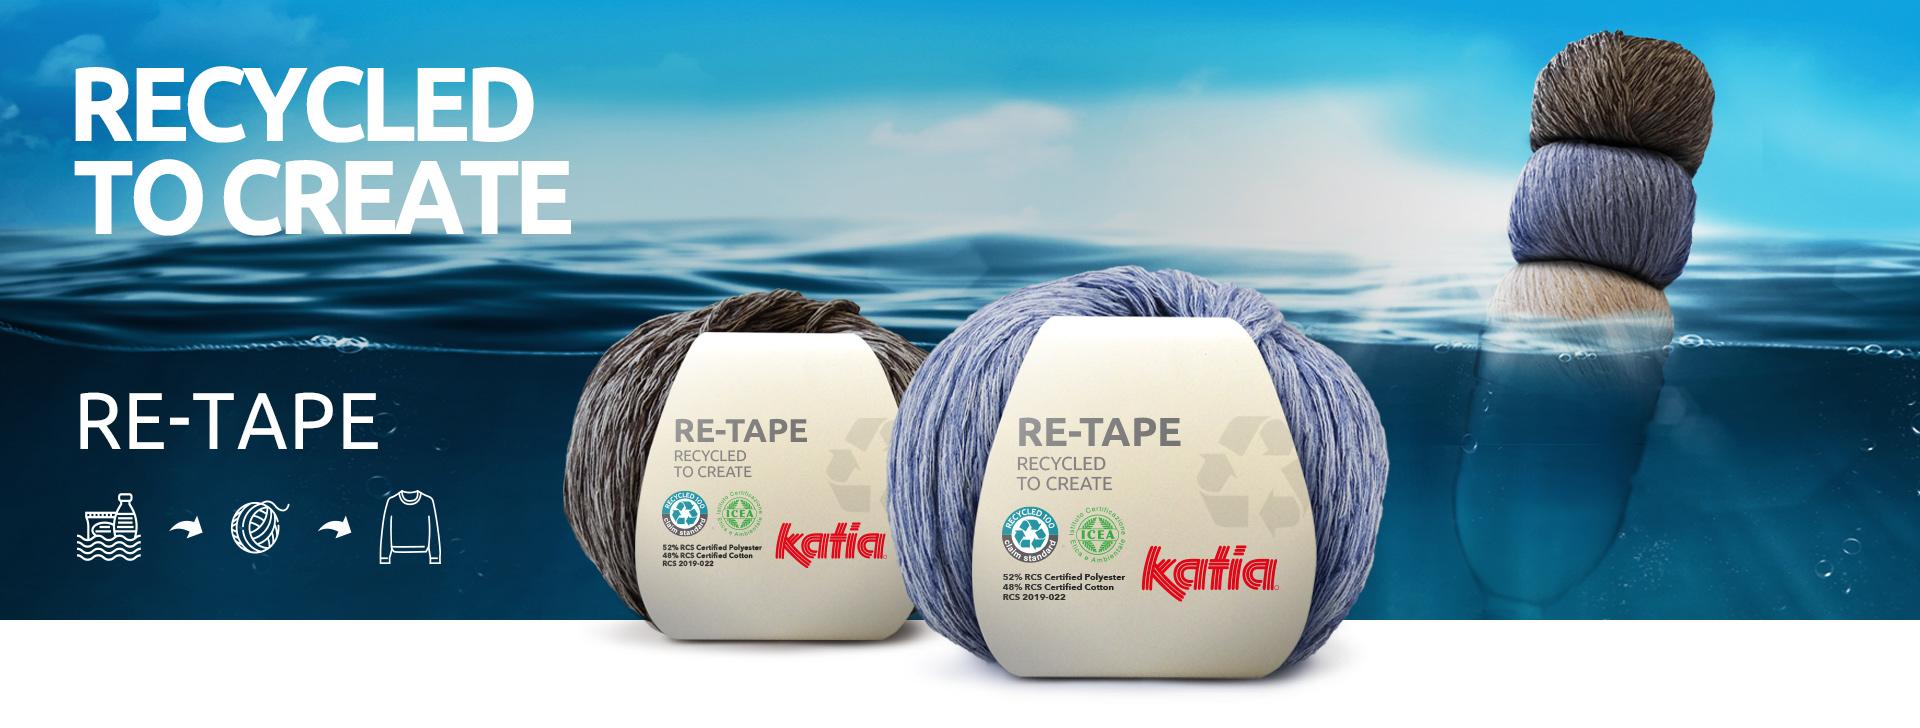 Re-tape recycled garen